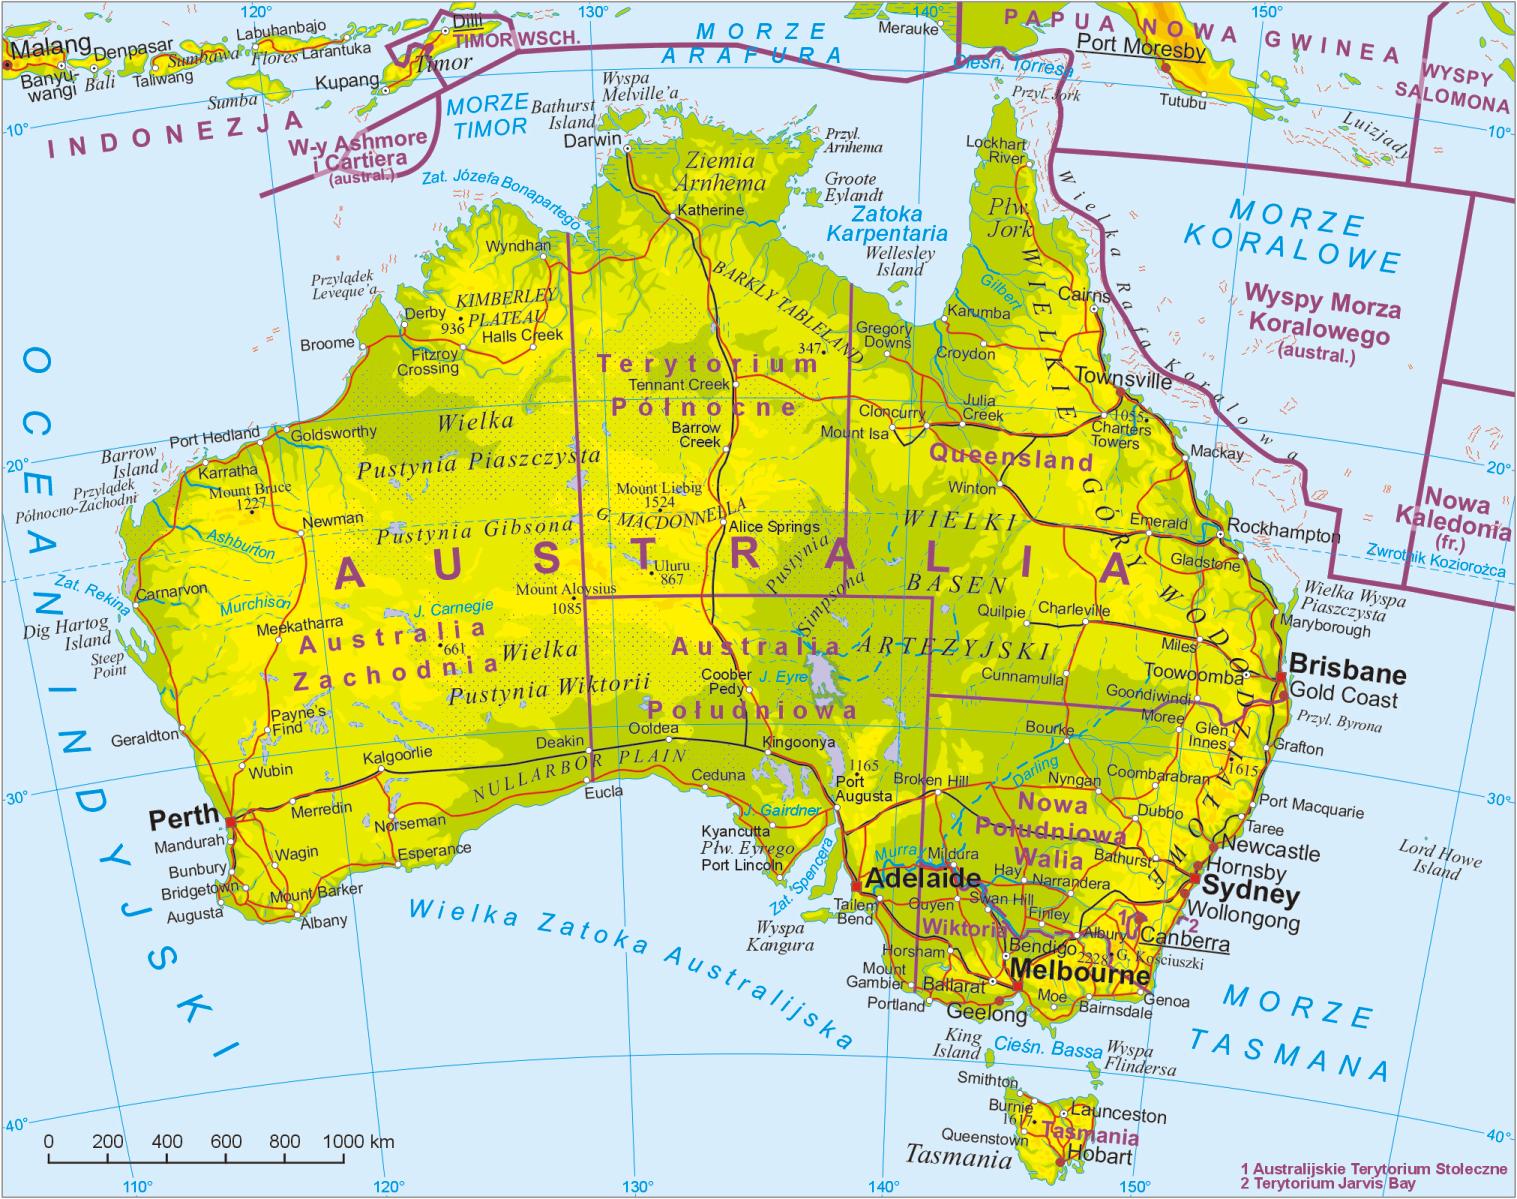 australia mapa File:Australia mapa.png   Wikimedia Commons australia mapa